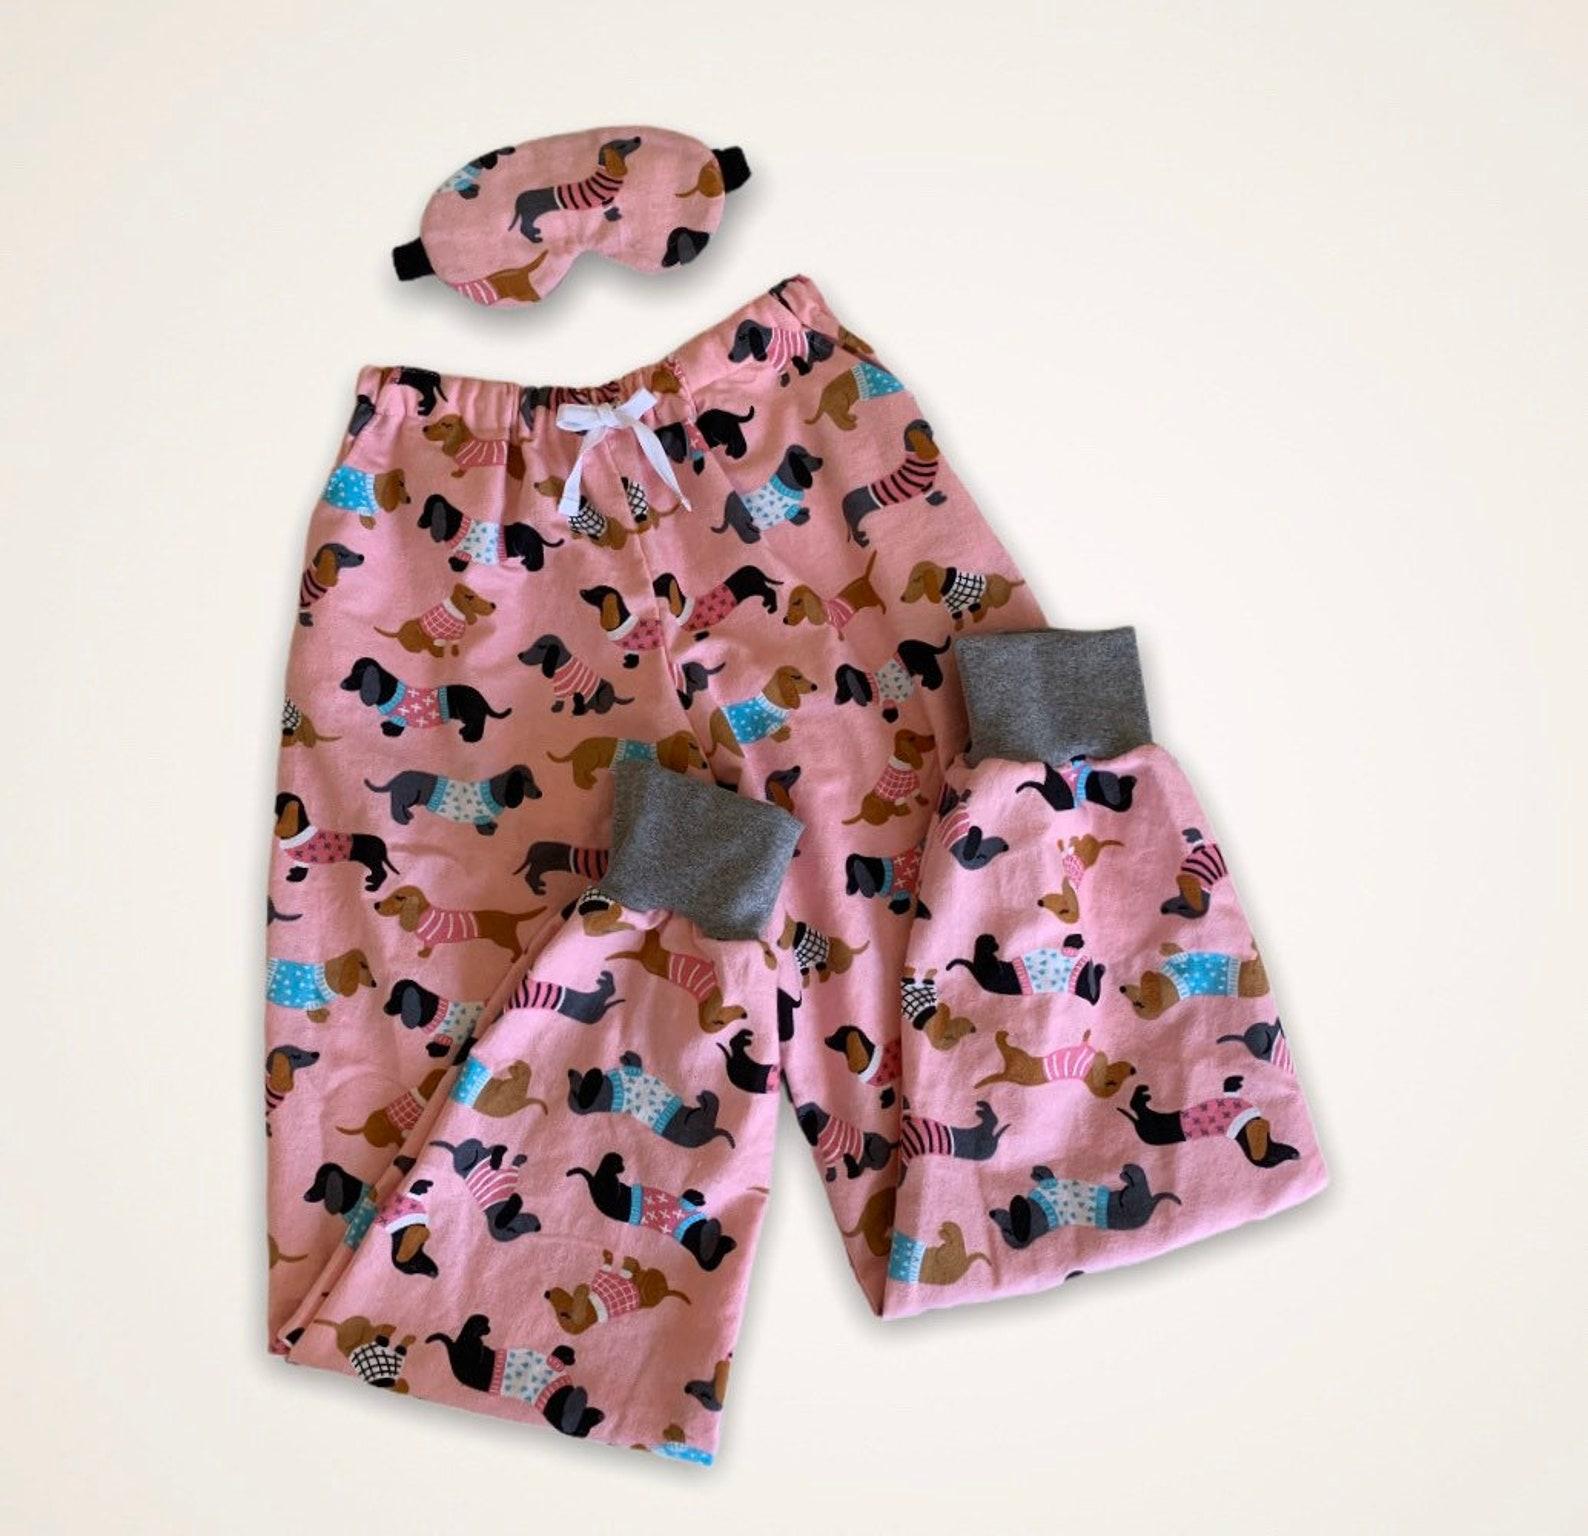 Pink flannelette pyjamas with dachshund print